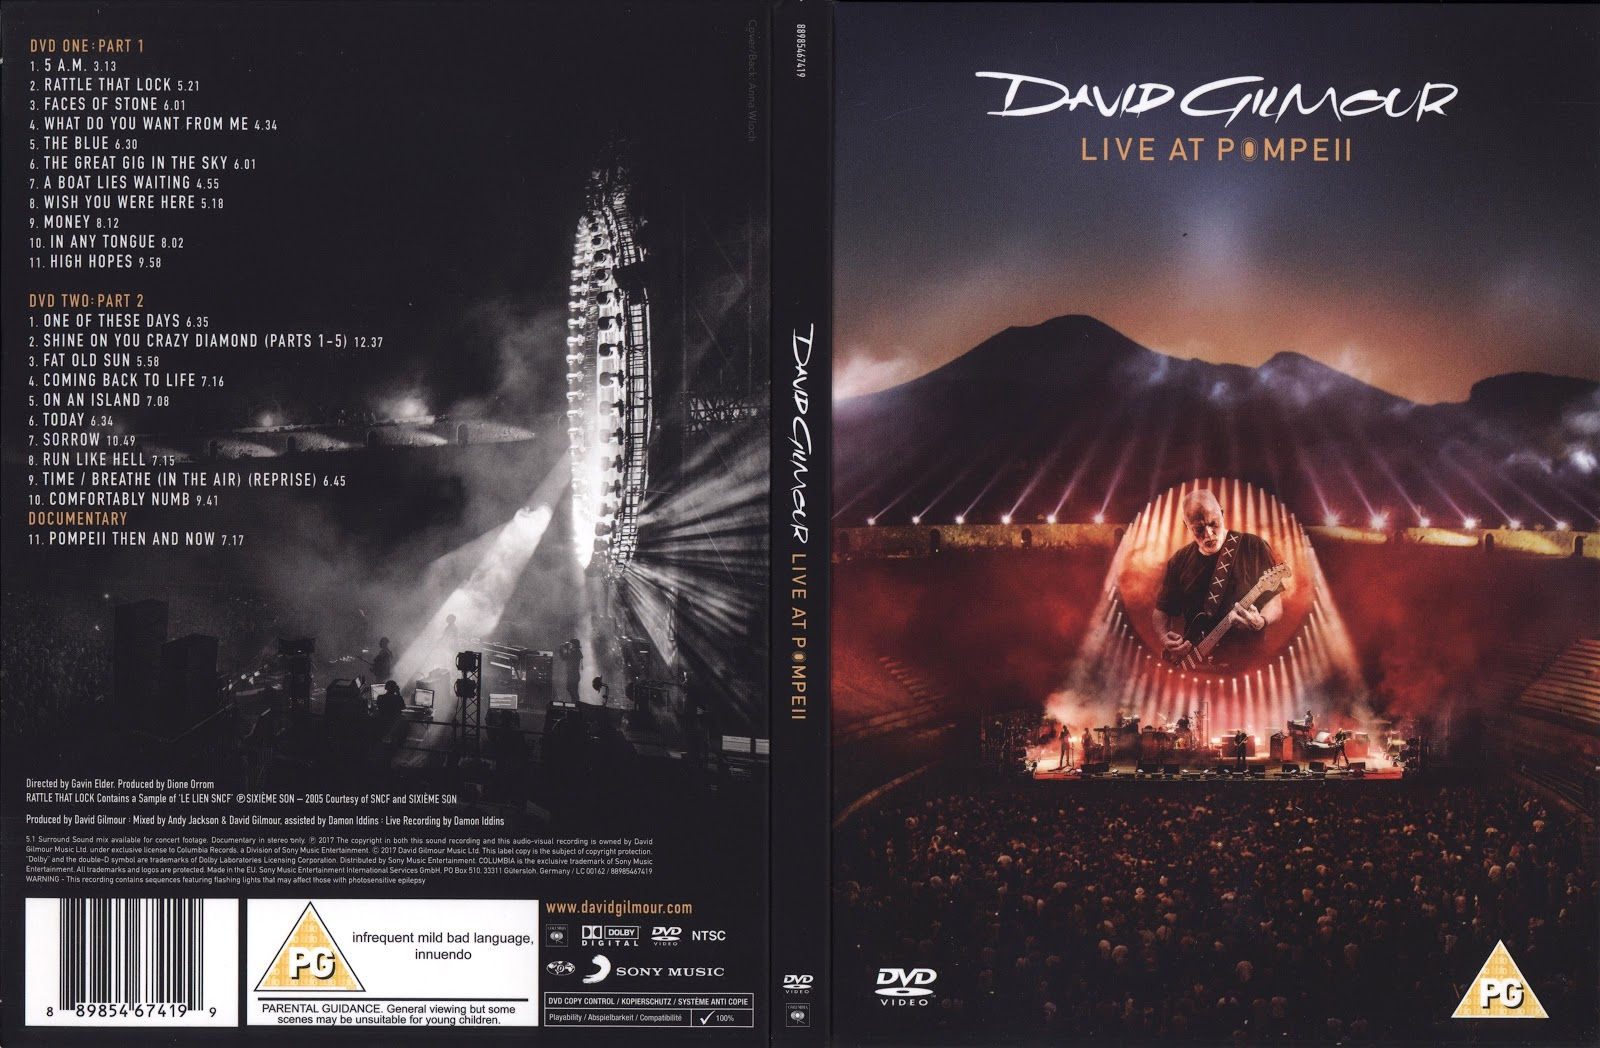 pink floyd ilustrado david gilmour live at pompeii dvd